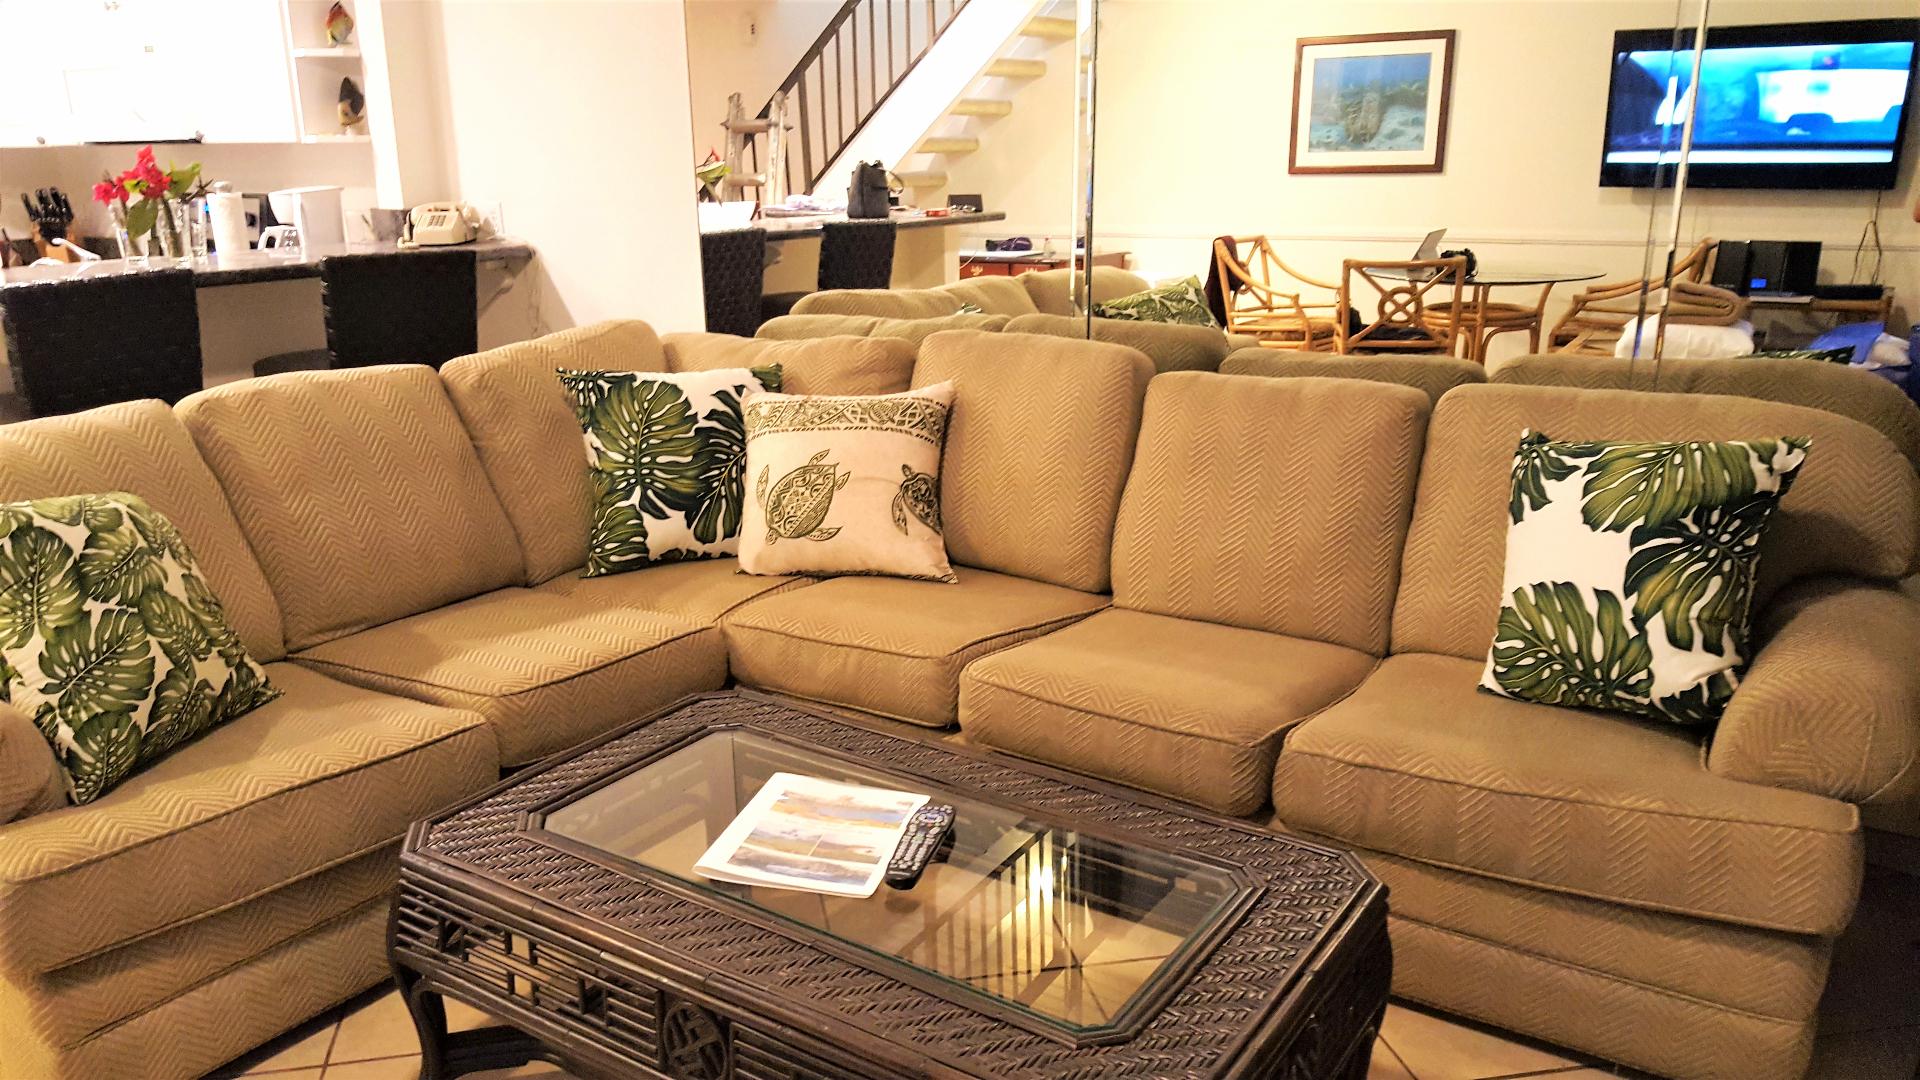 C20 Living room